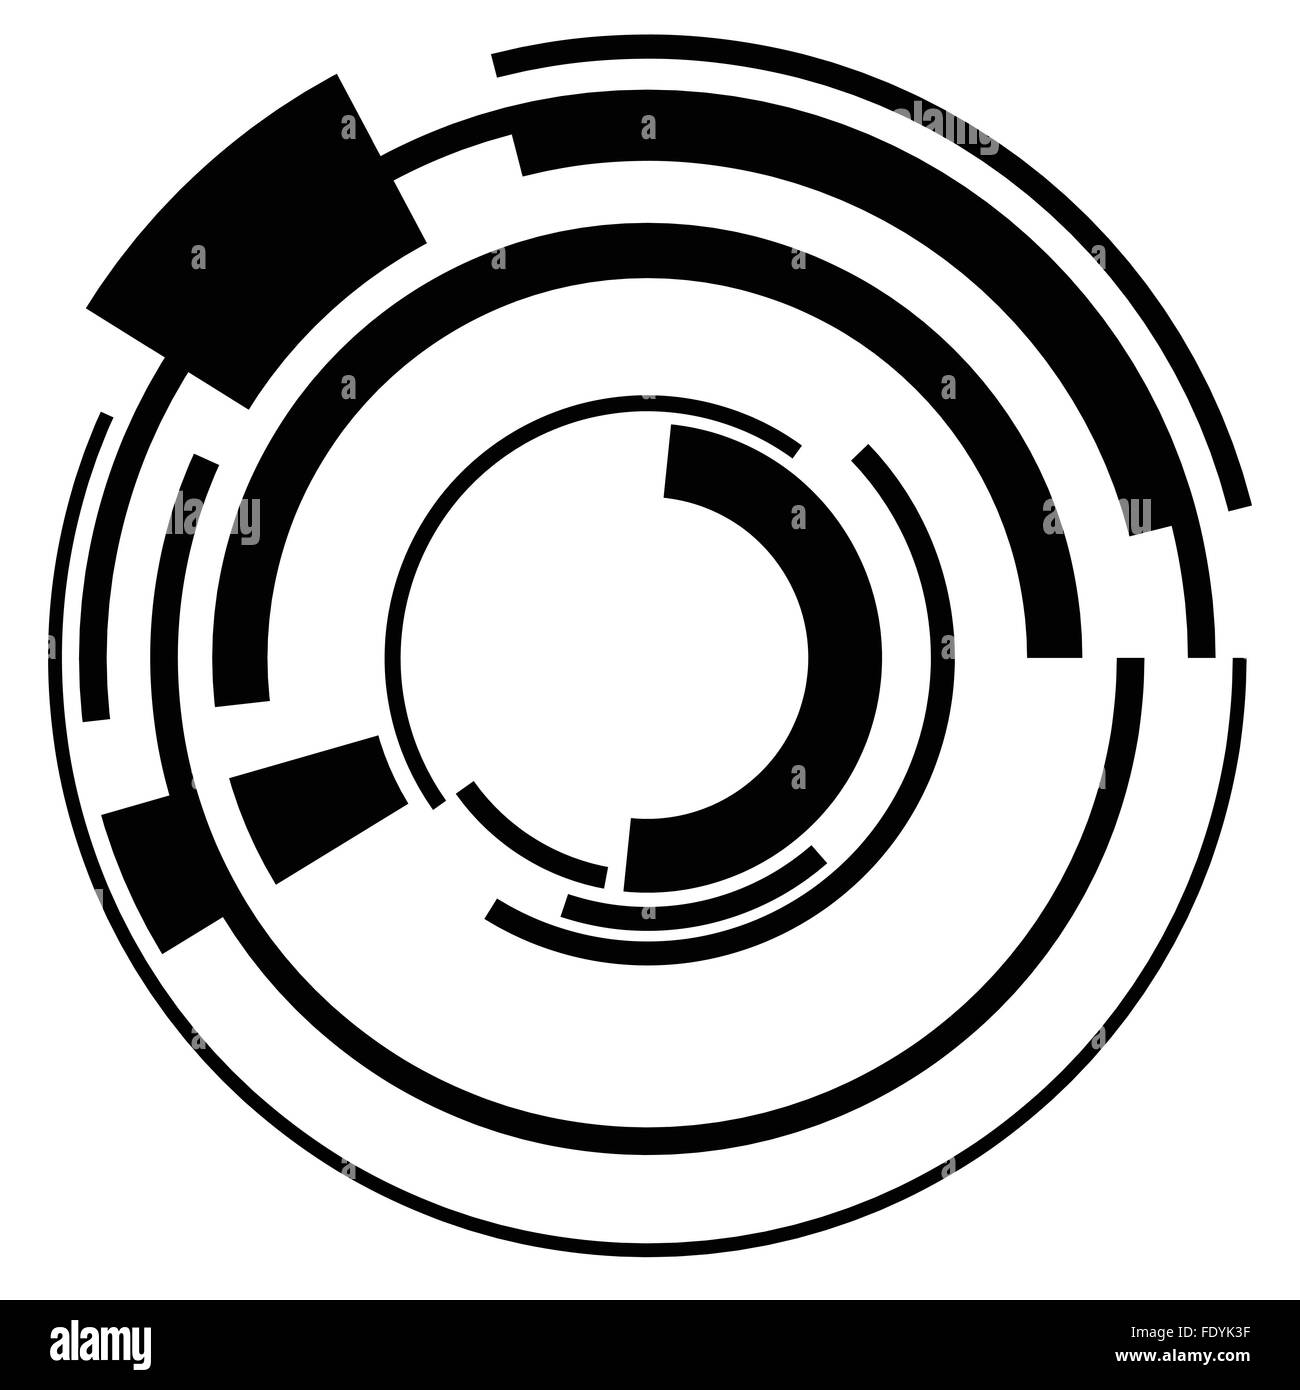 Abstract Hi Tech Segmented Geometric Circle Shape Isolated